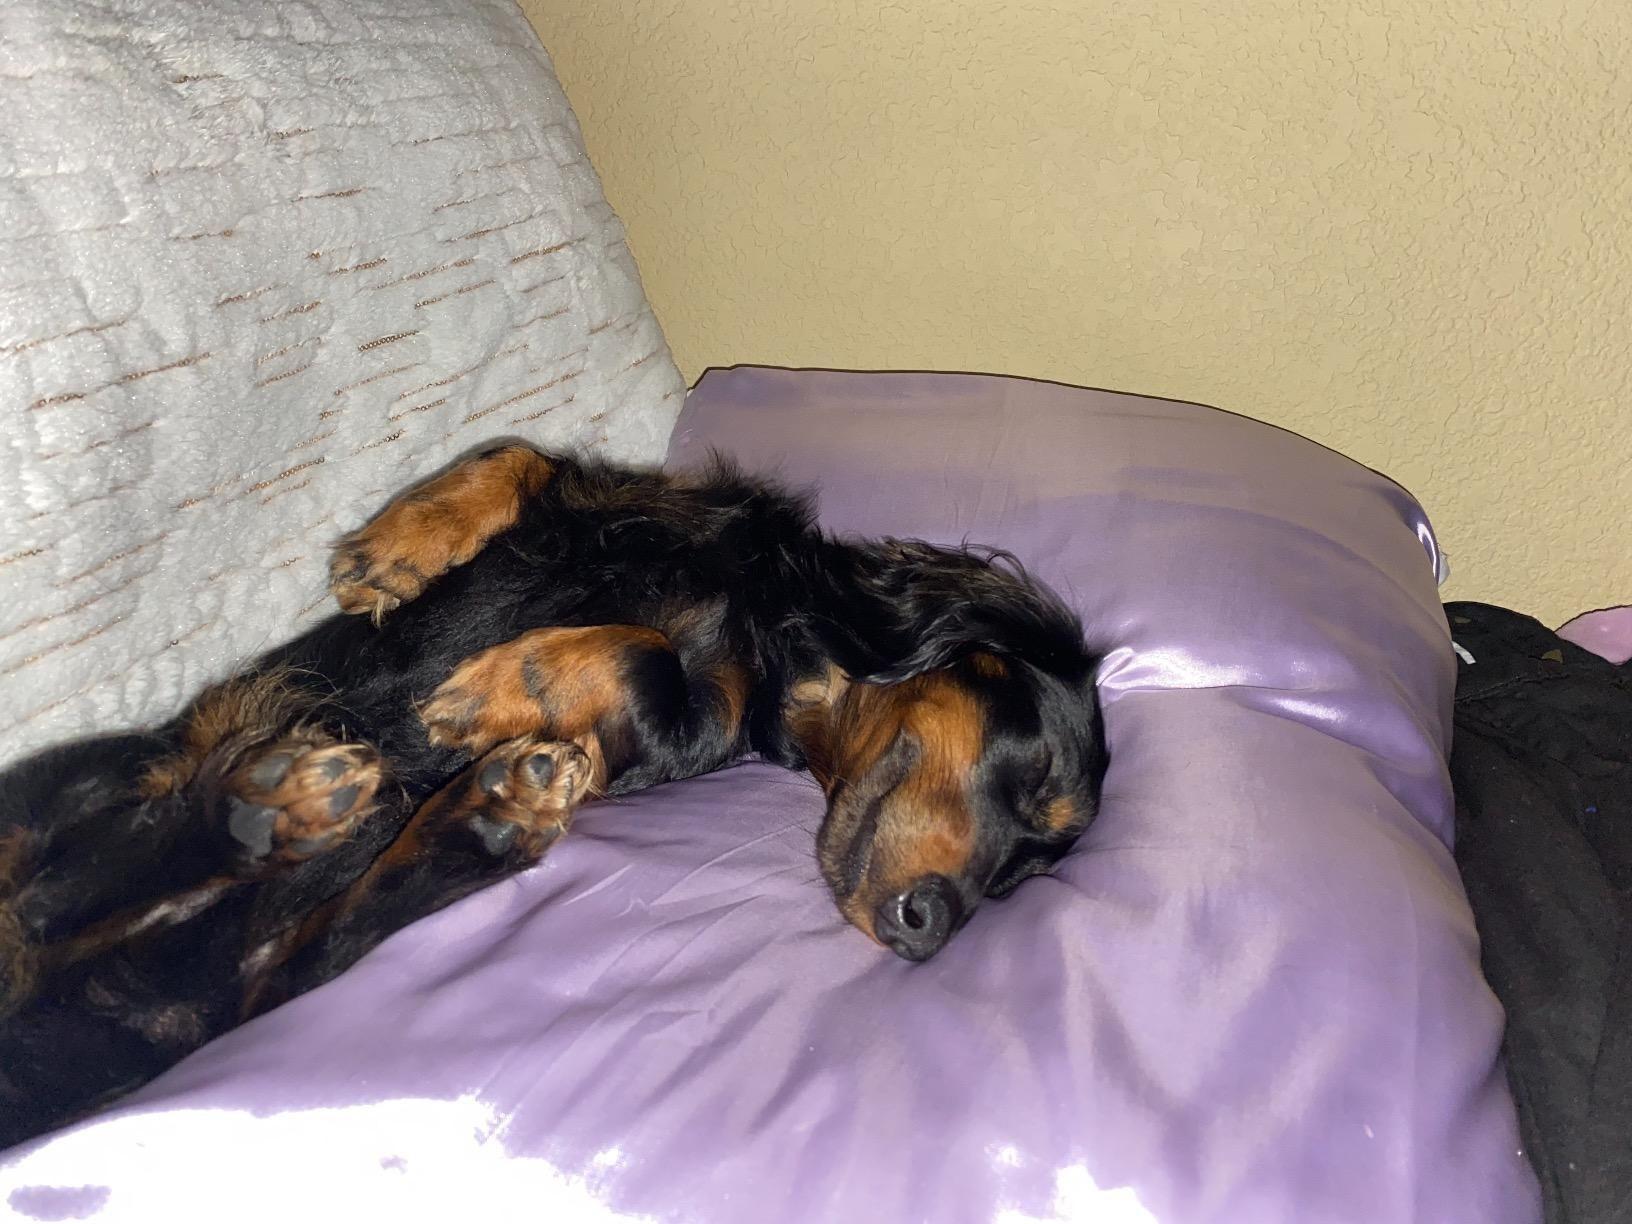 dachshund sleeps upside down on purple satin pillow